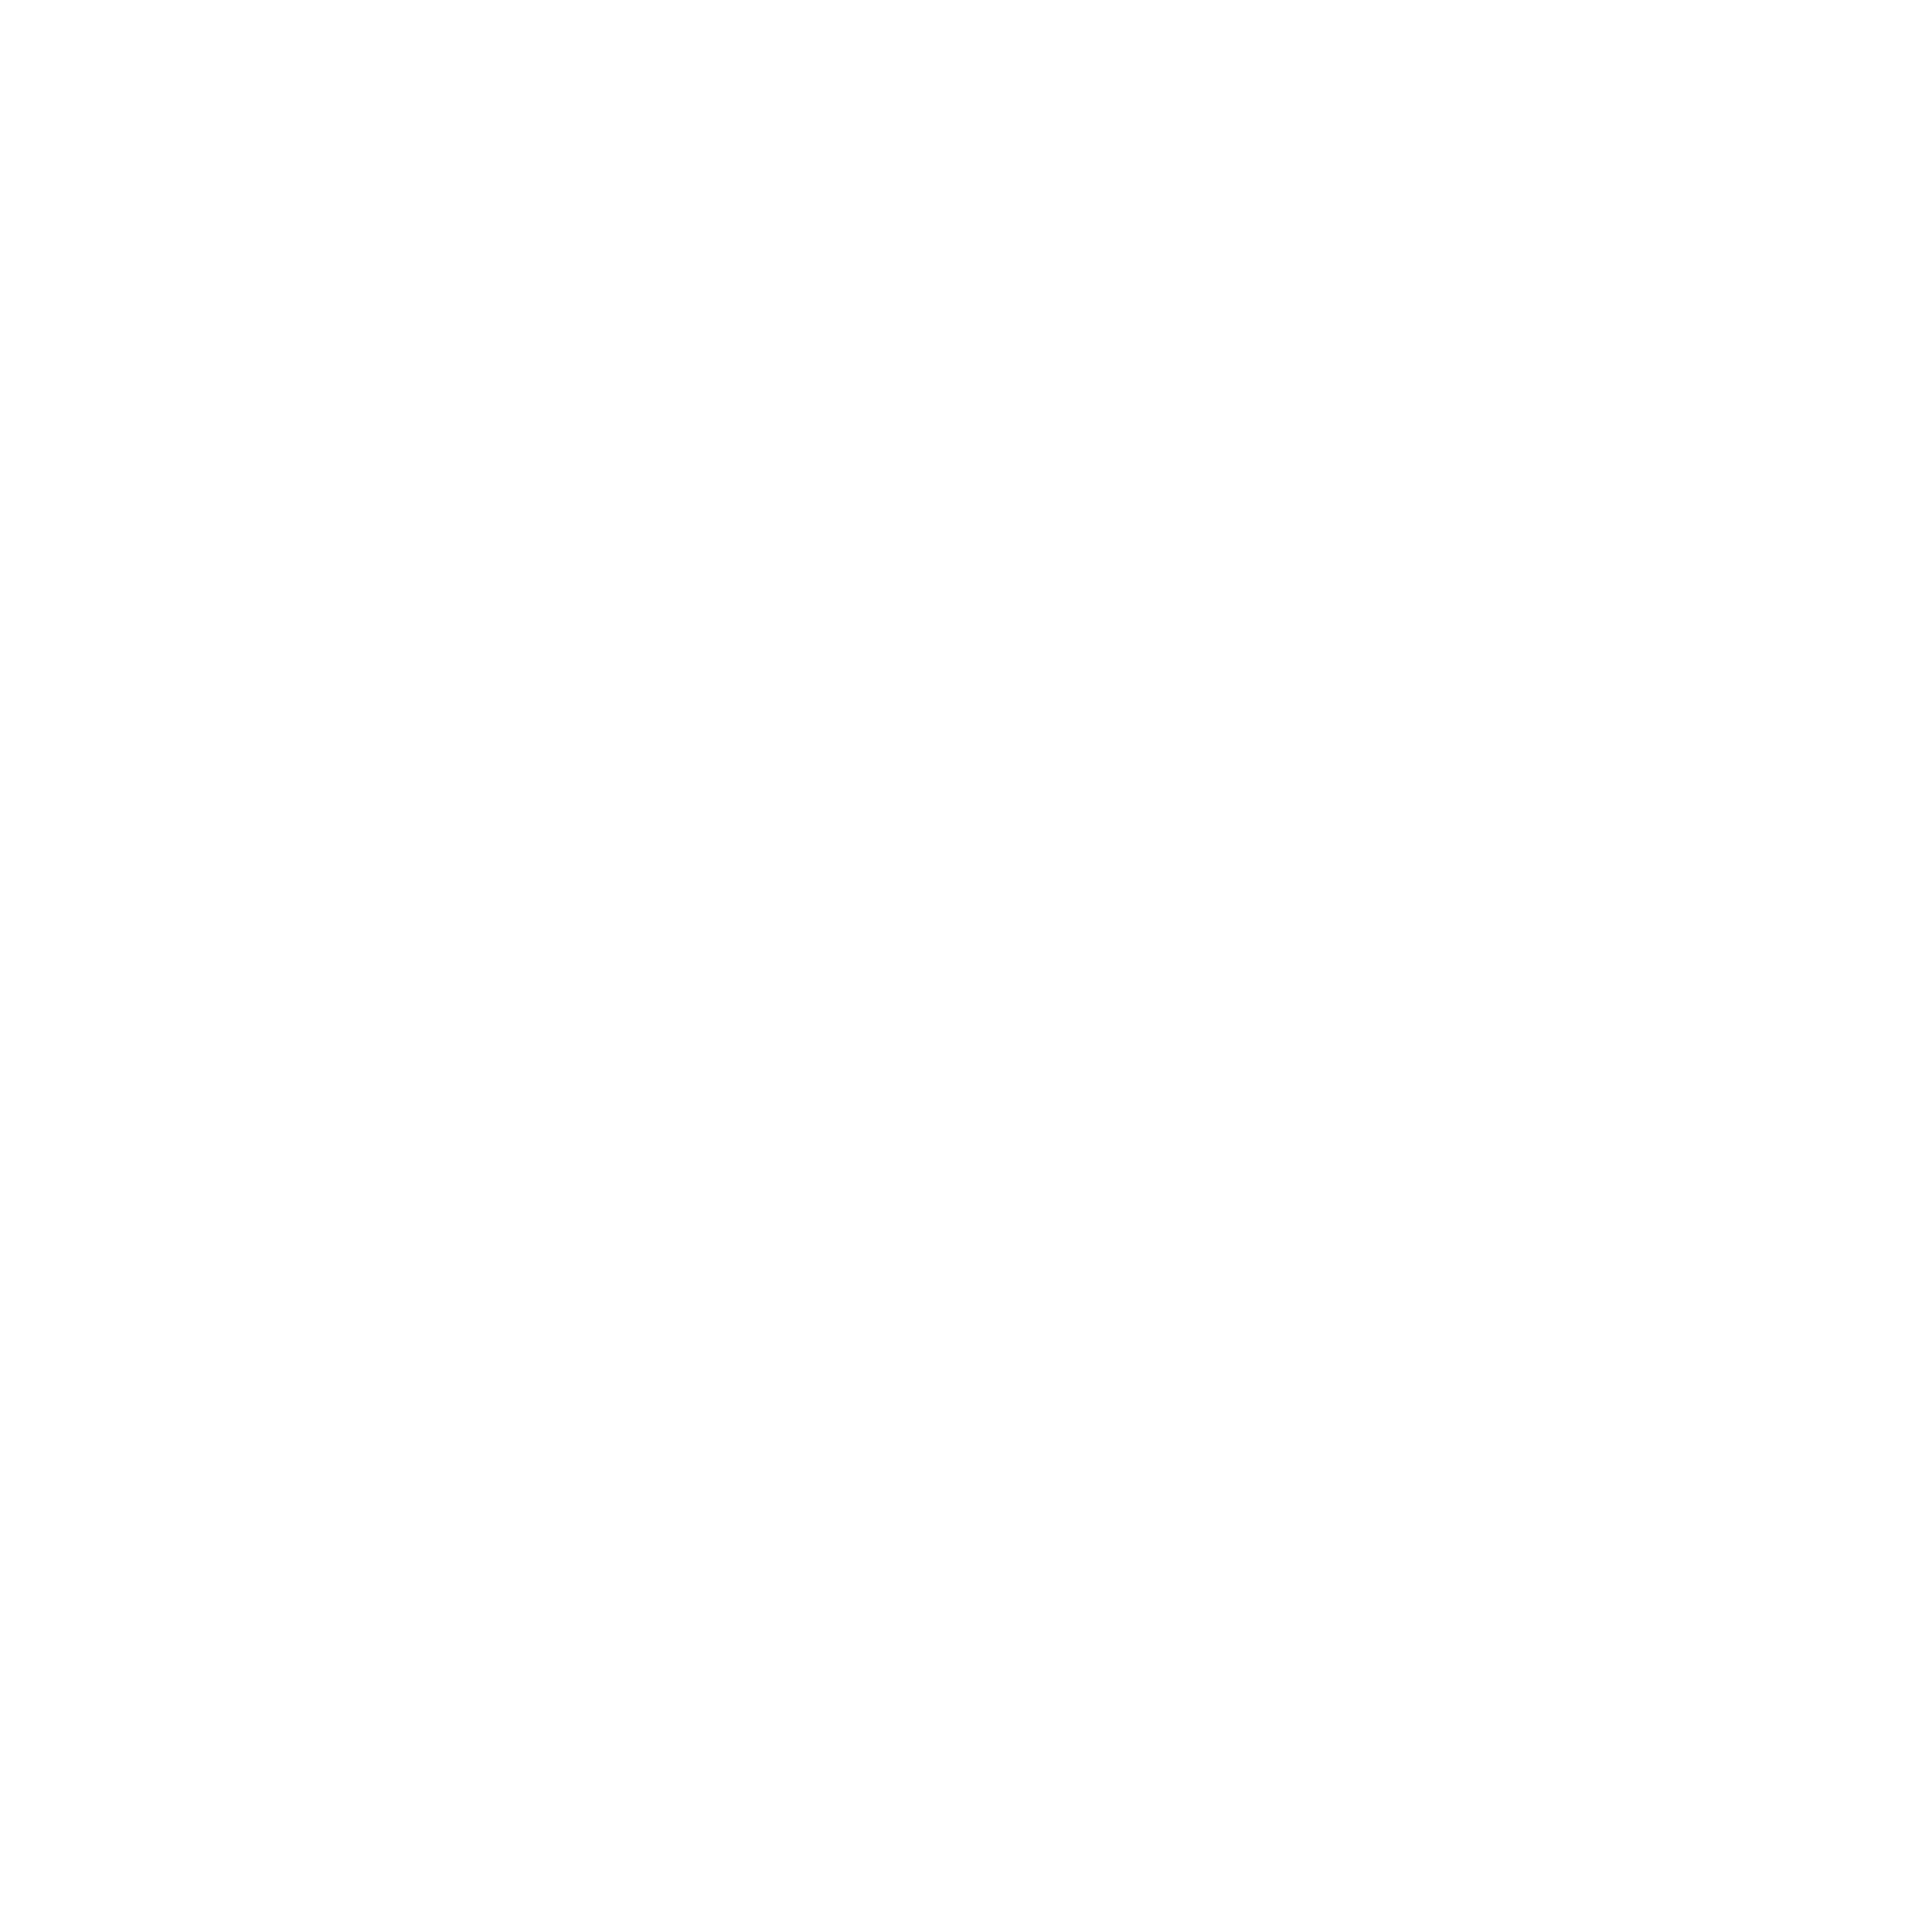 KIA-1.png